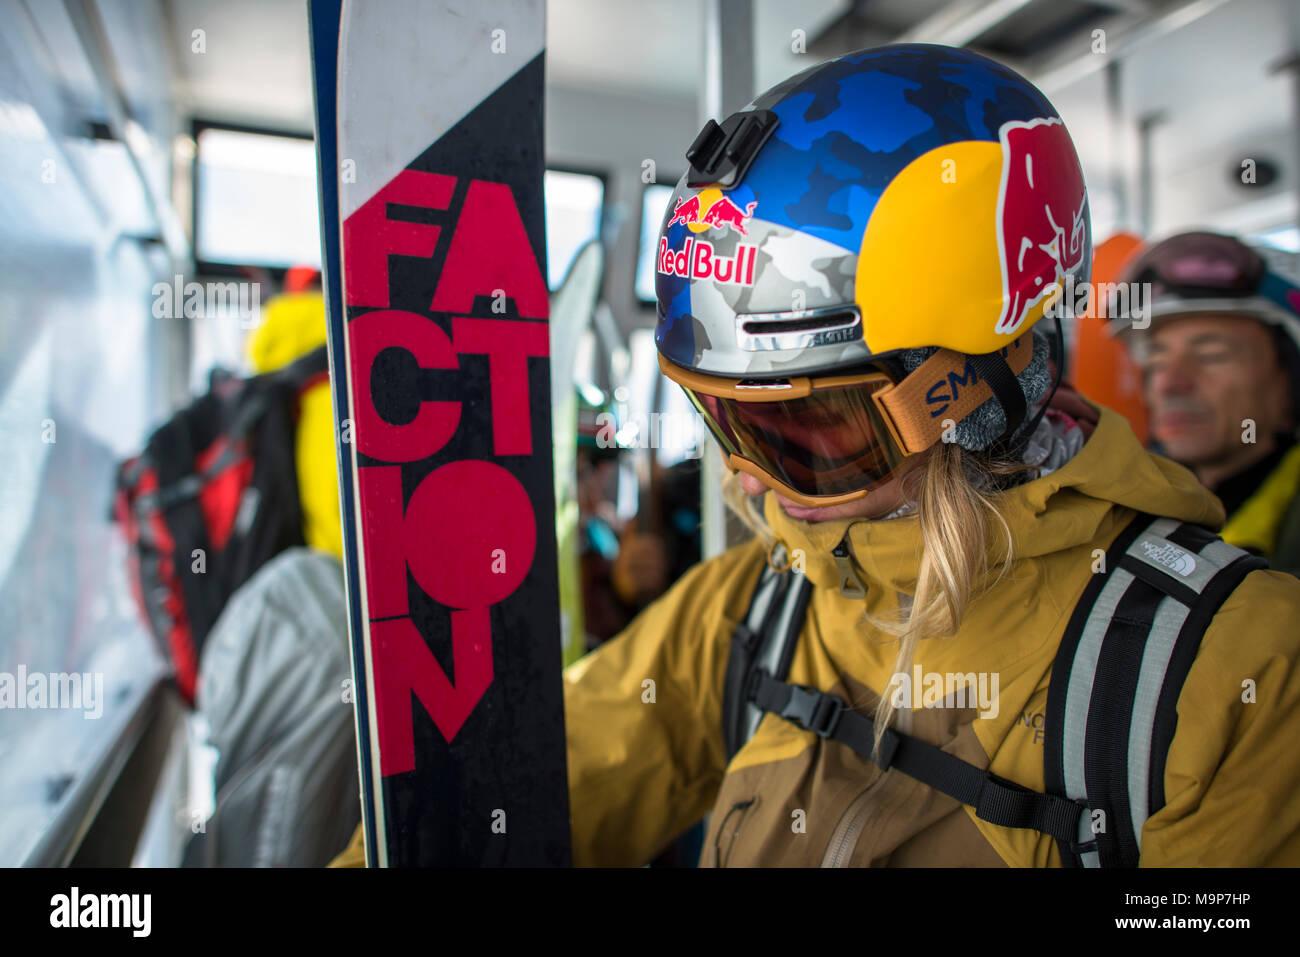 Professional skier wearing skiwear, Monterosa Ski mountain resort in Gressoney, Aosta, Italy - Stock Image